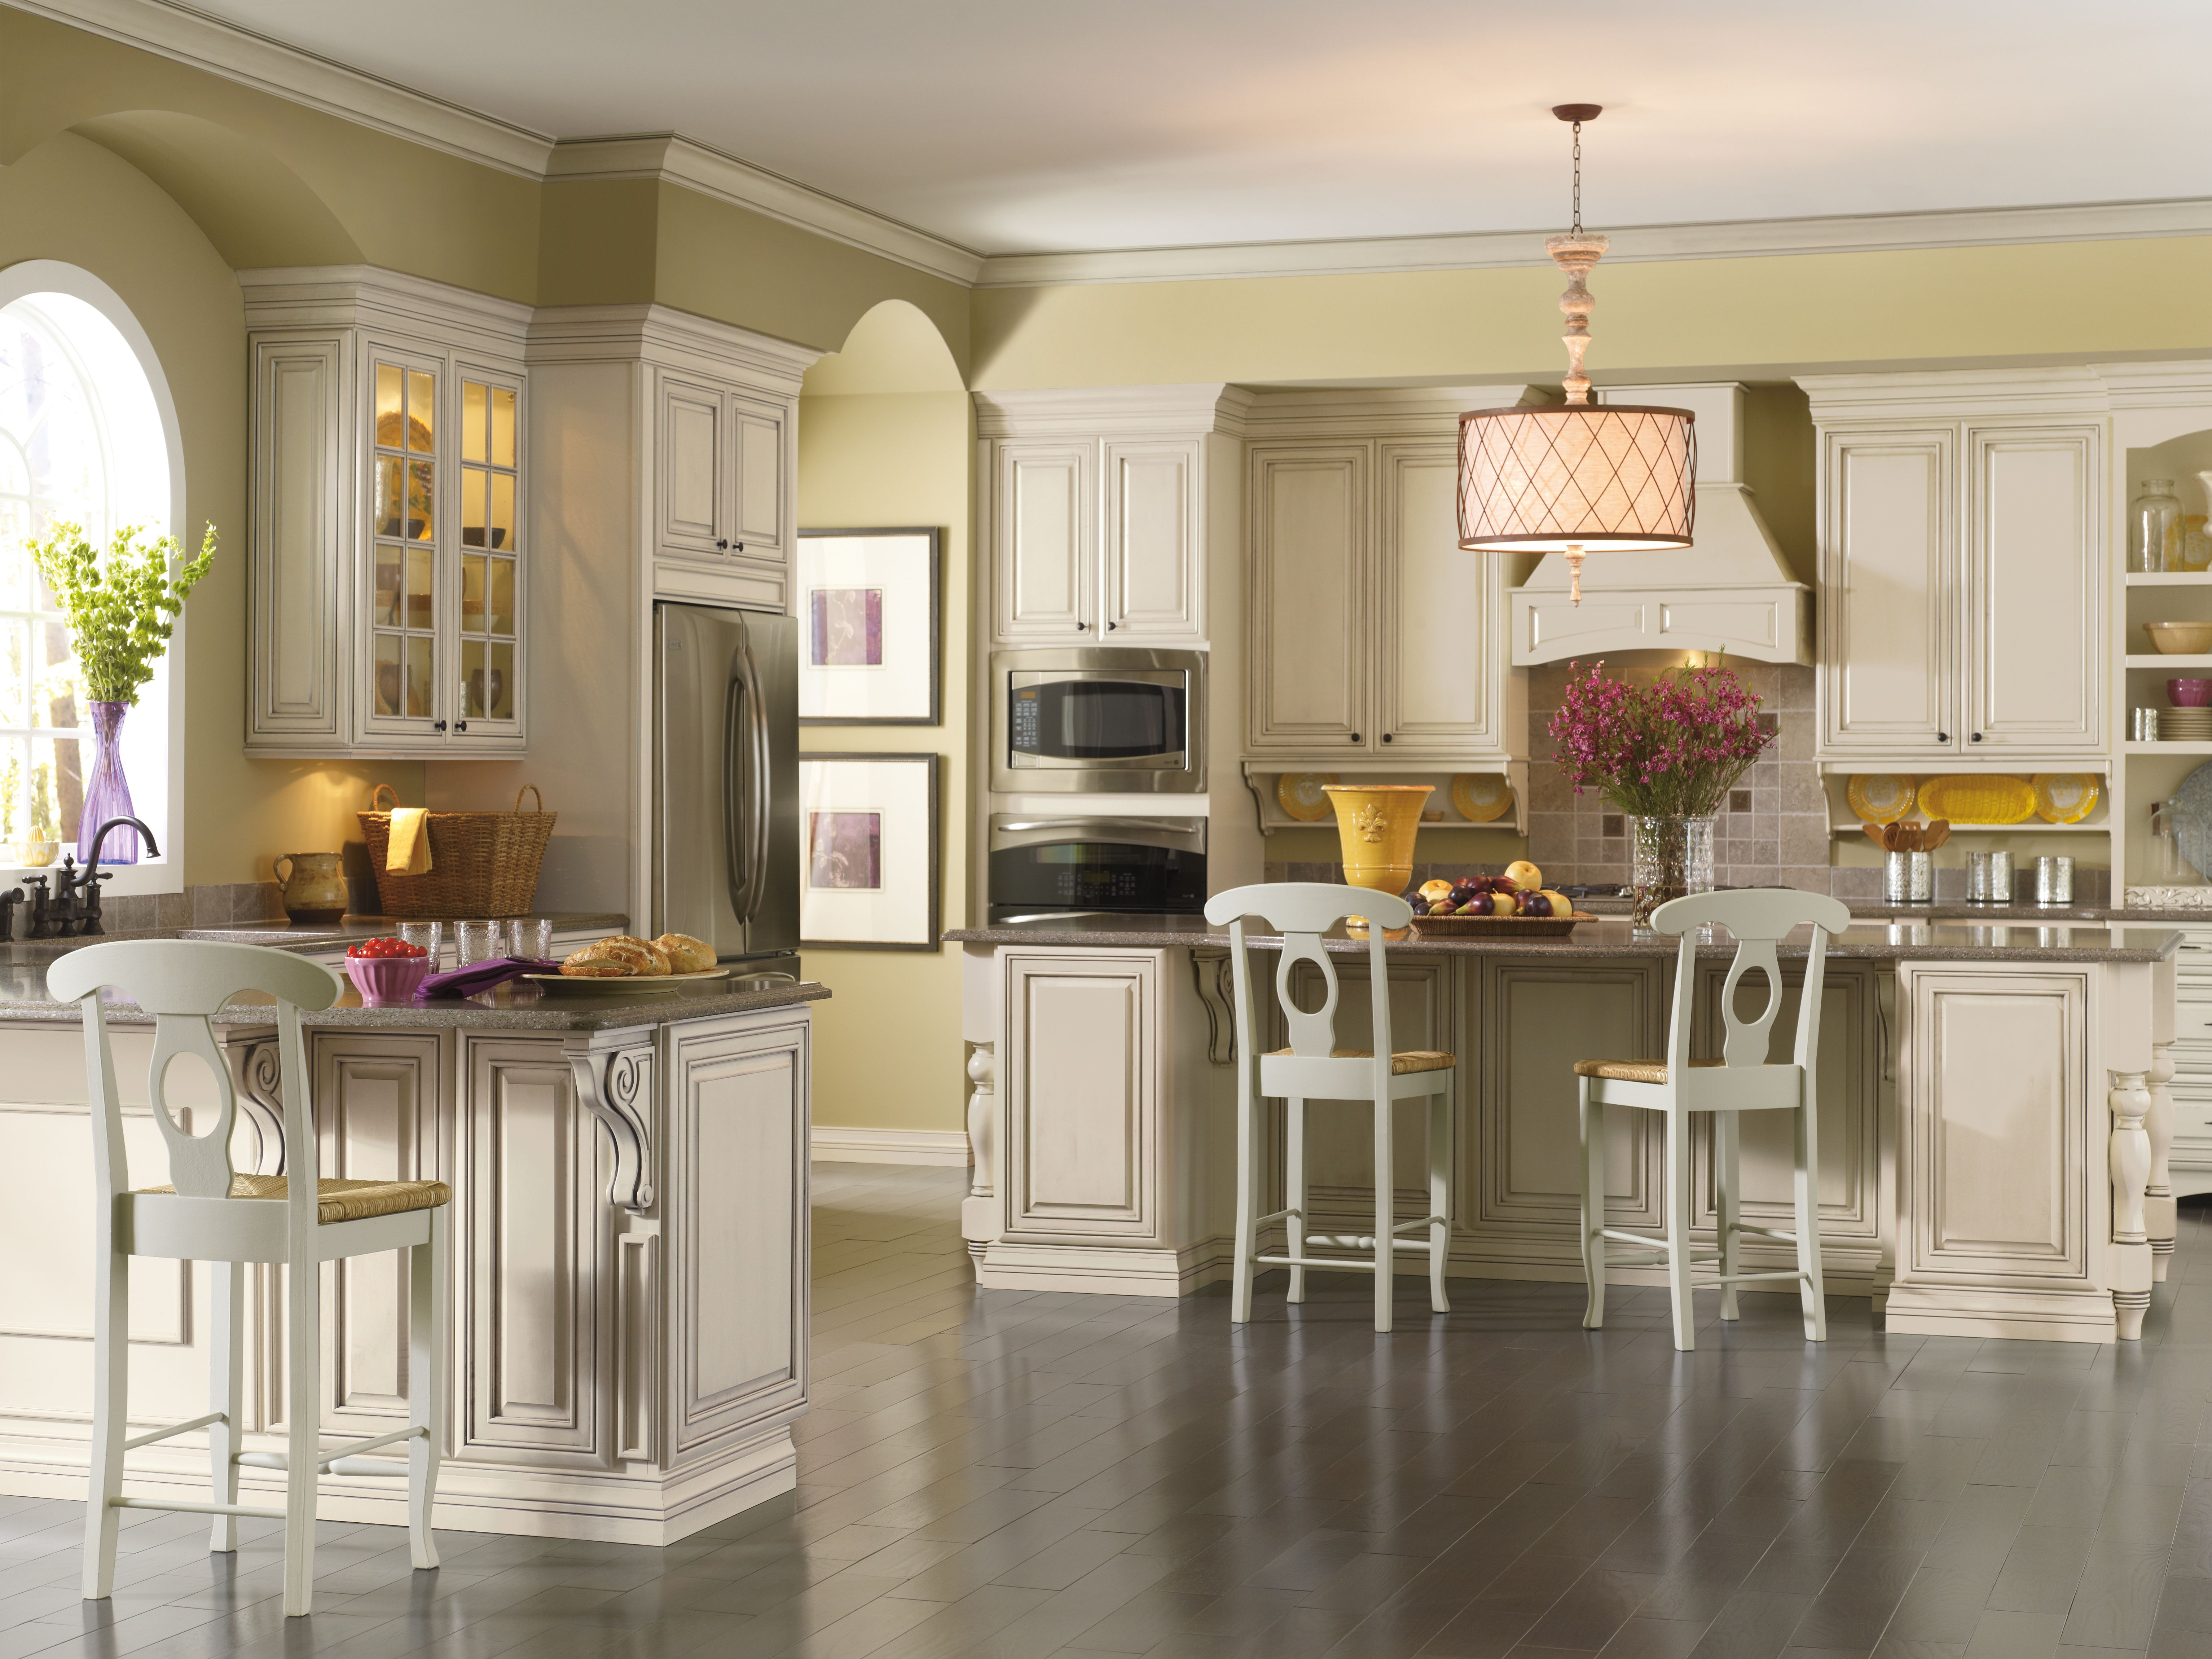 Kemper Gallery  Interior Innovations  Kitchen  Pinterest Endearing Kitchen Design Innovations Inspiration Design